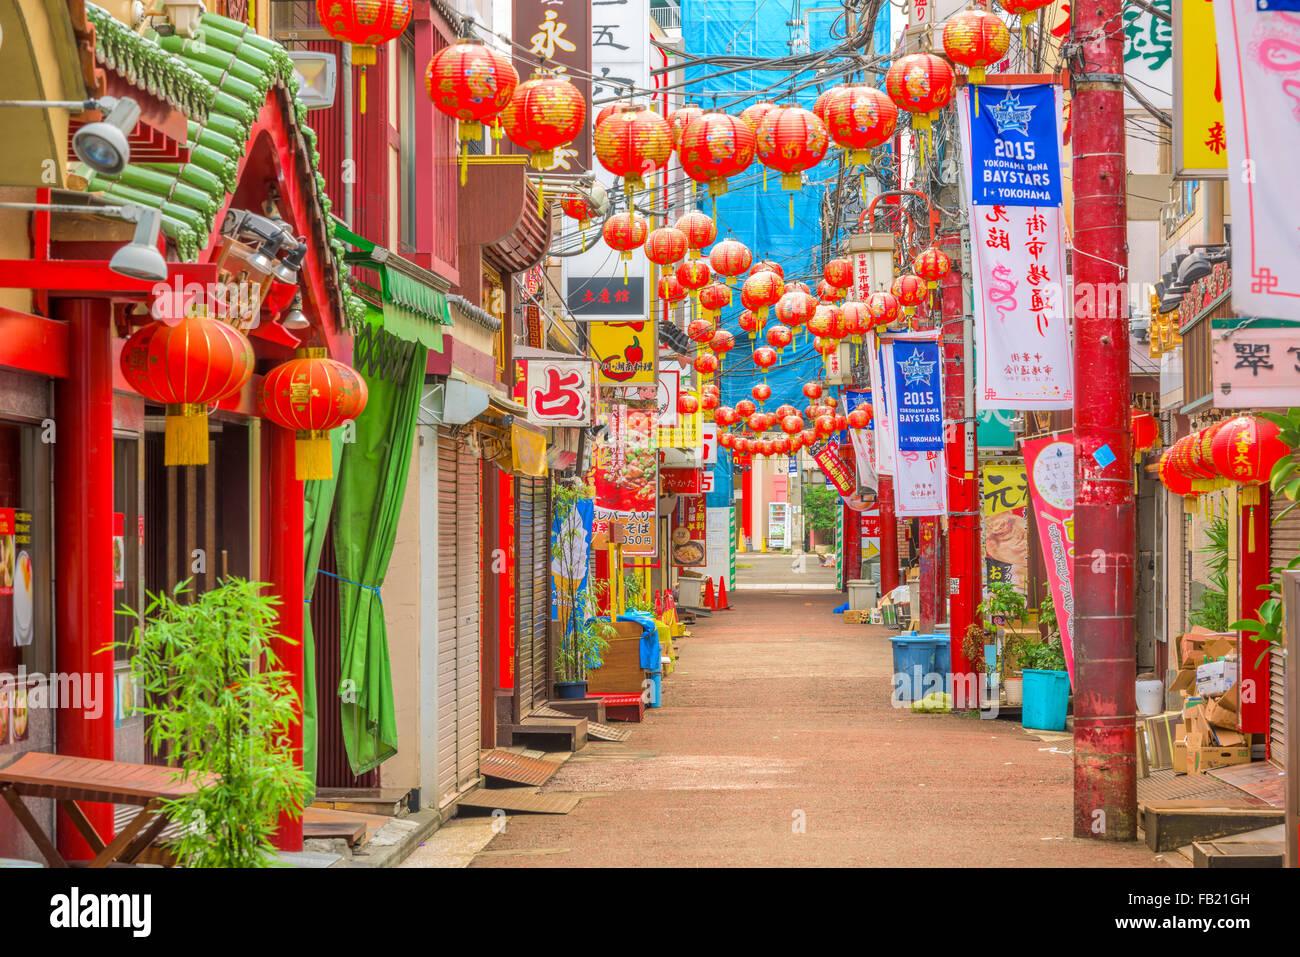 YOKOHAMA, JAPAN - 11. August 2015: Yokohama Chinatown Bezirk. Es ist die größte Chinatown in Japan. Stockbild